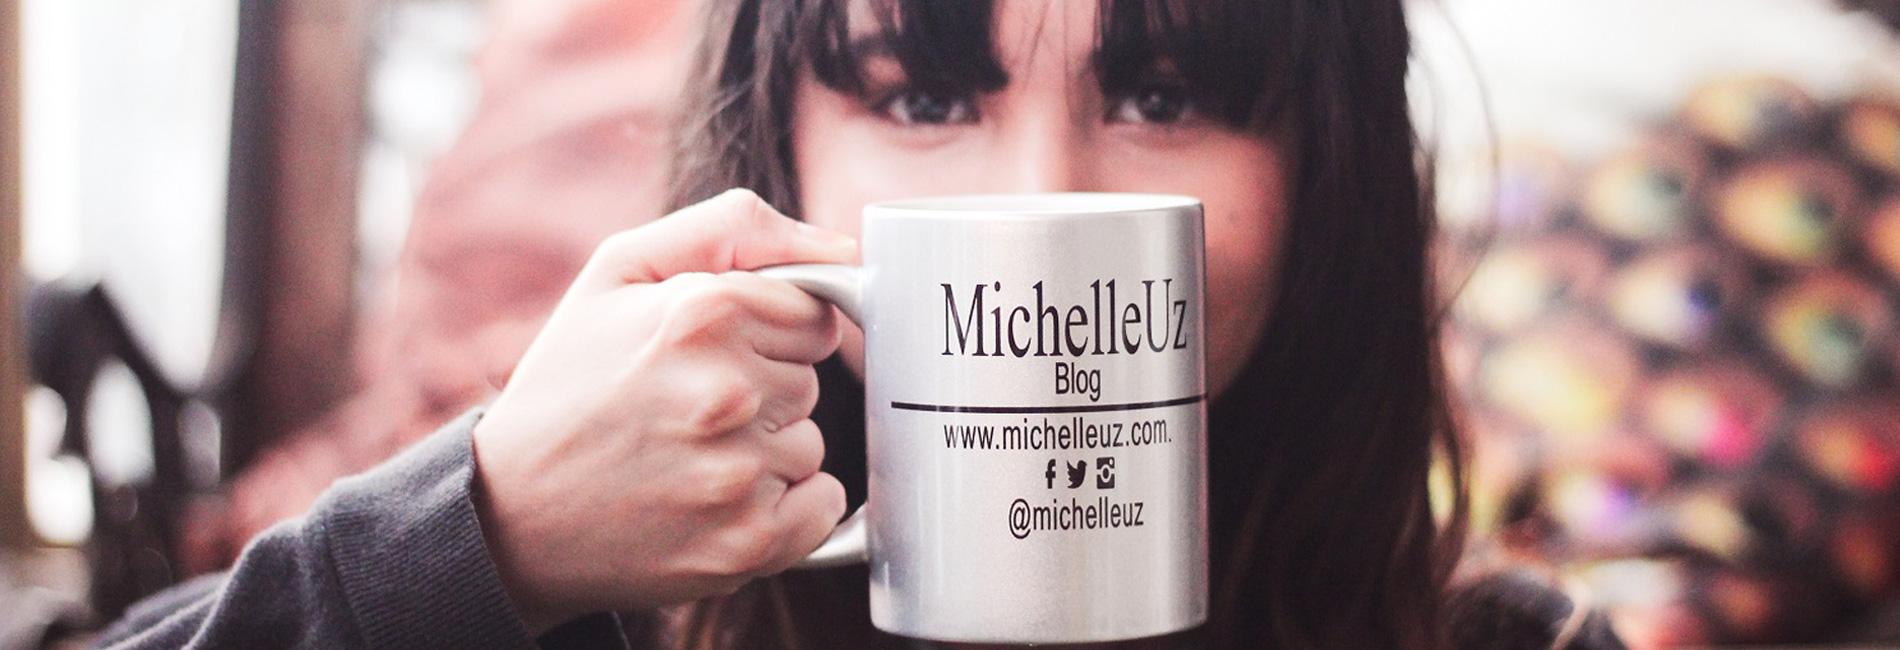 ¡Feliz cumpleaños #3 a MichelleUz blog!